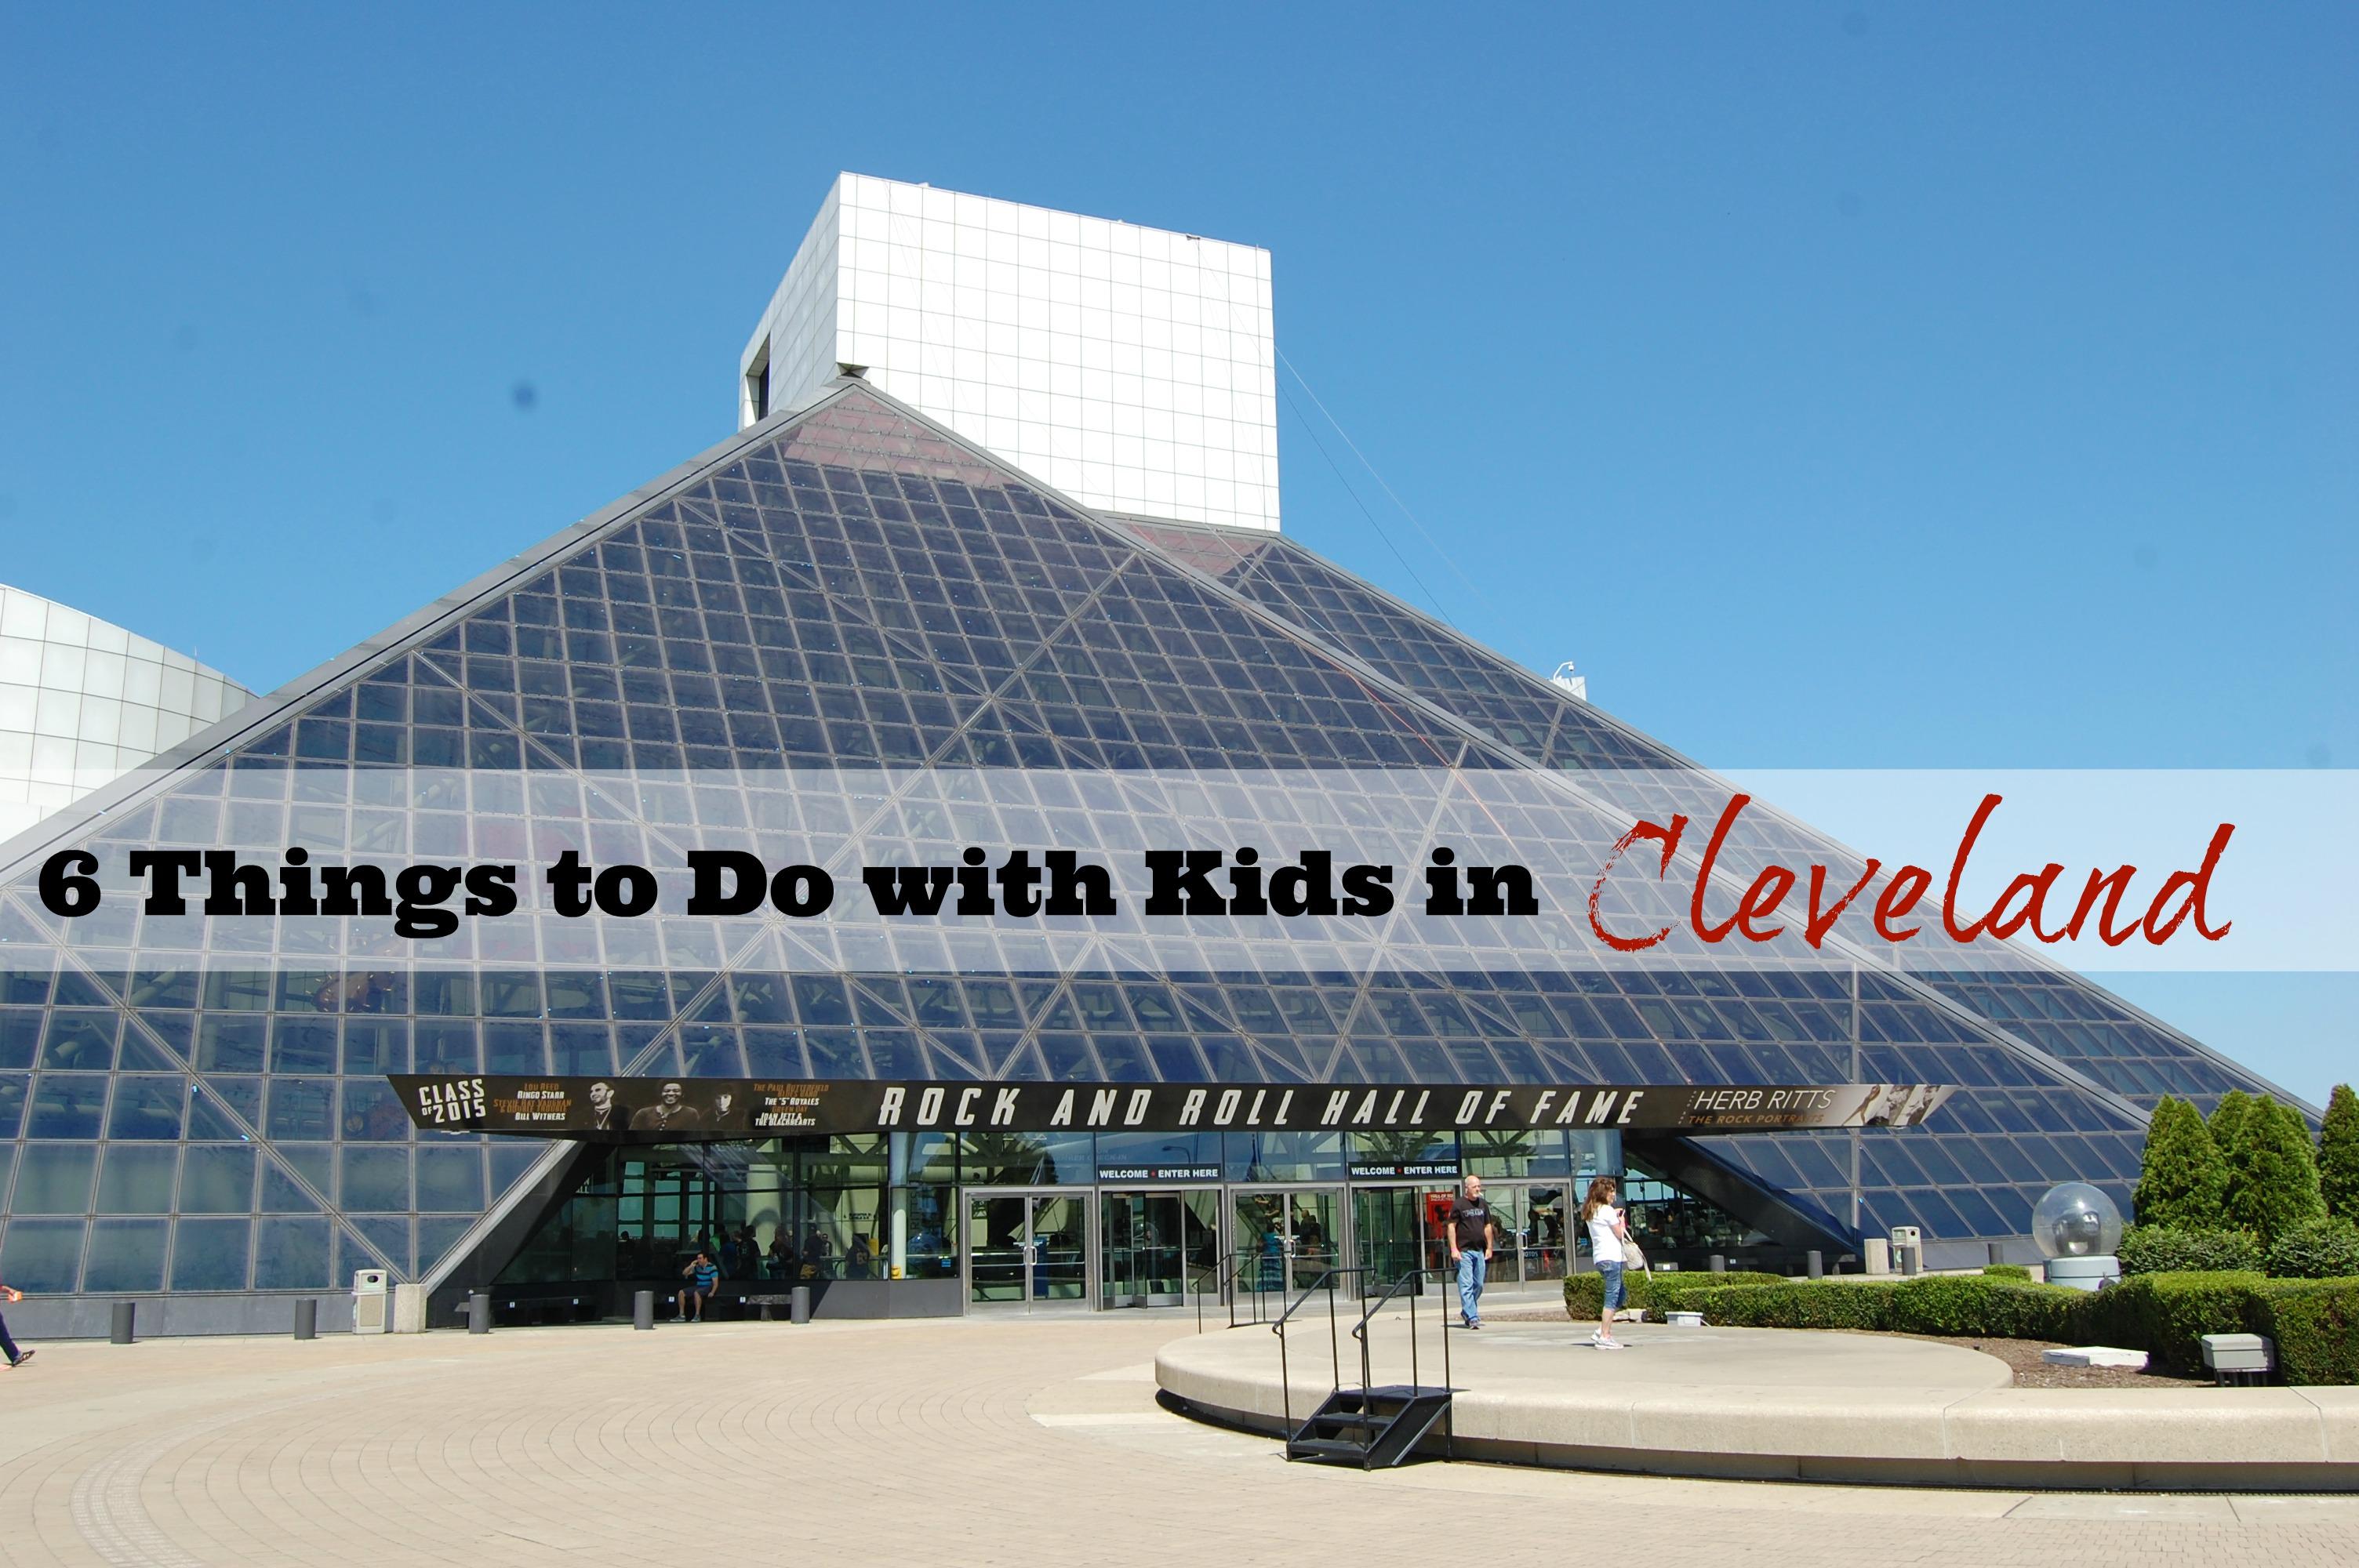 In Cleveland Ohio